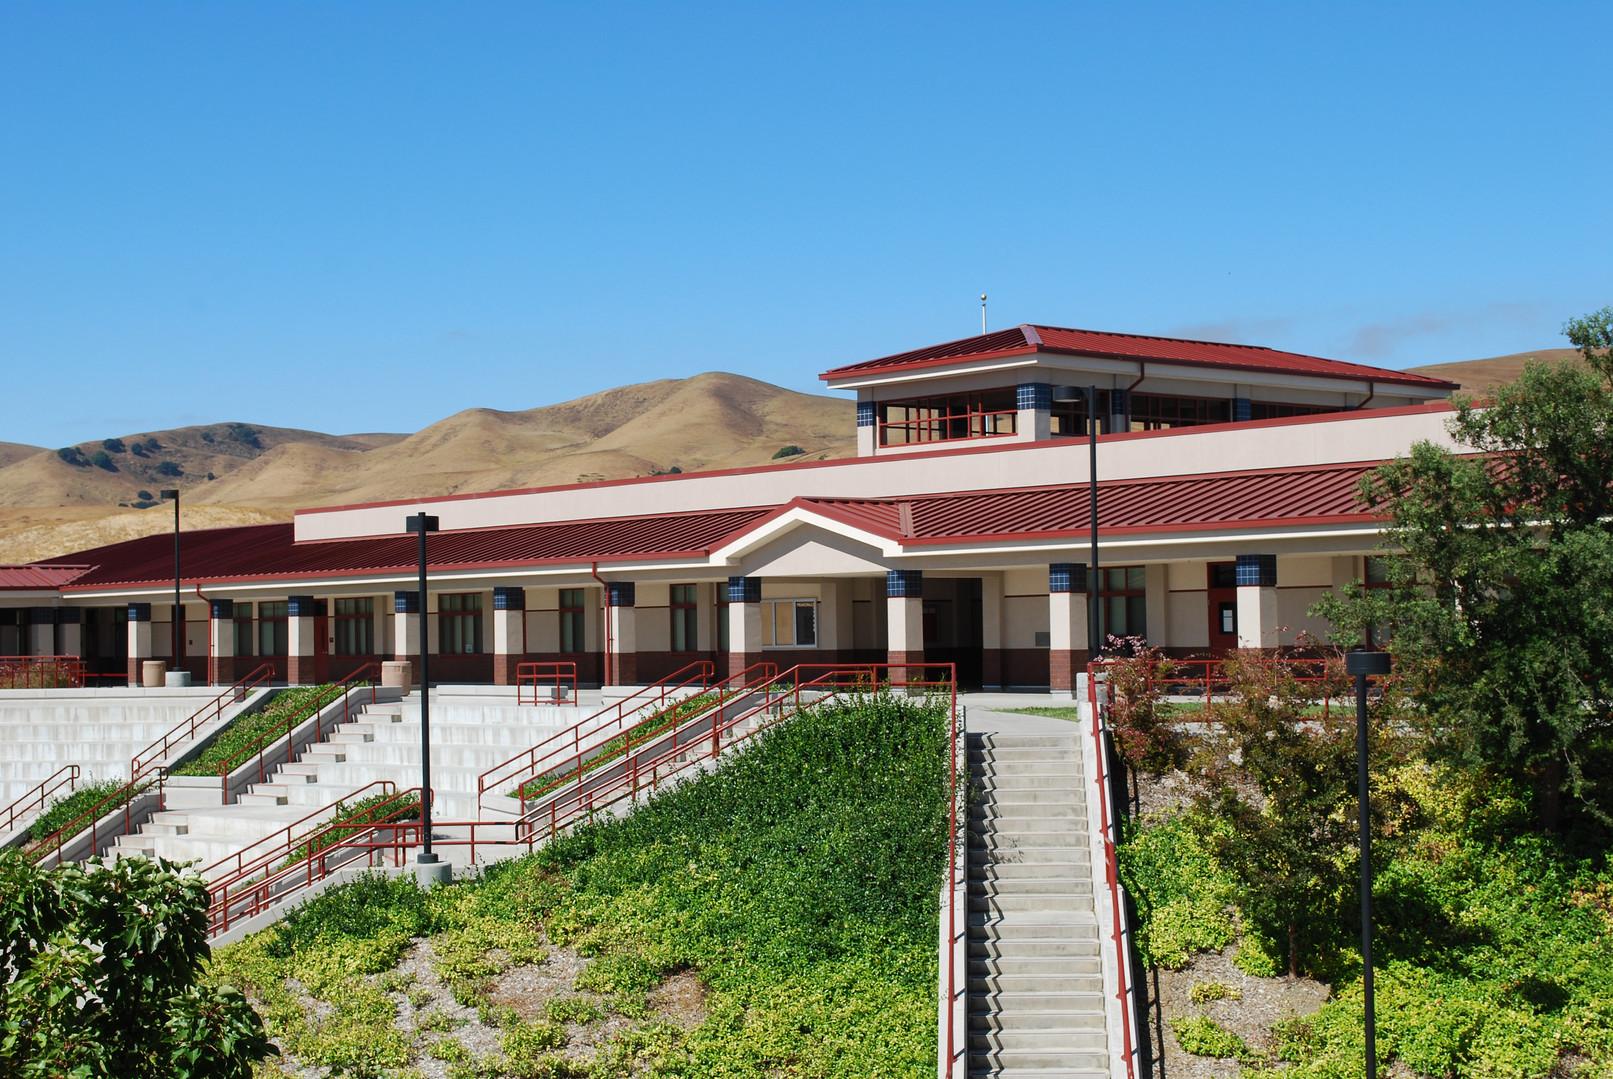 Cordelia Hills Elementary School Courtyard